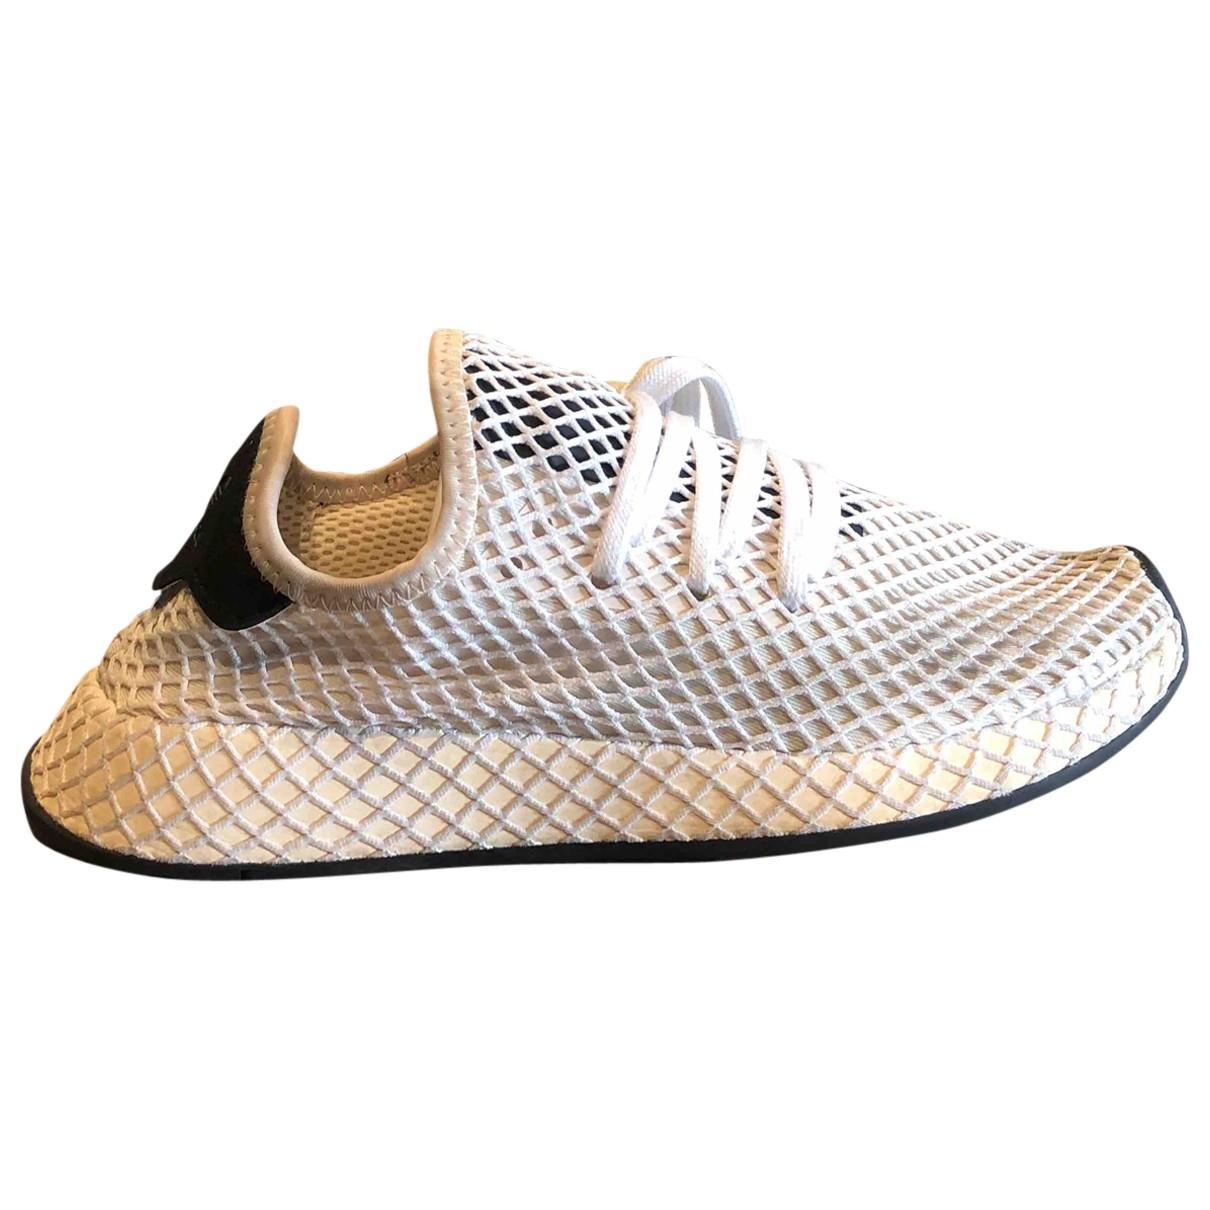 Adidas - Baskets Deerupt Runner pour femme en toile - blanc